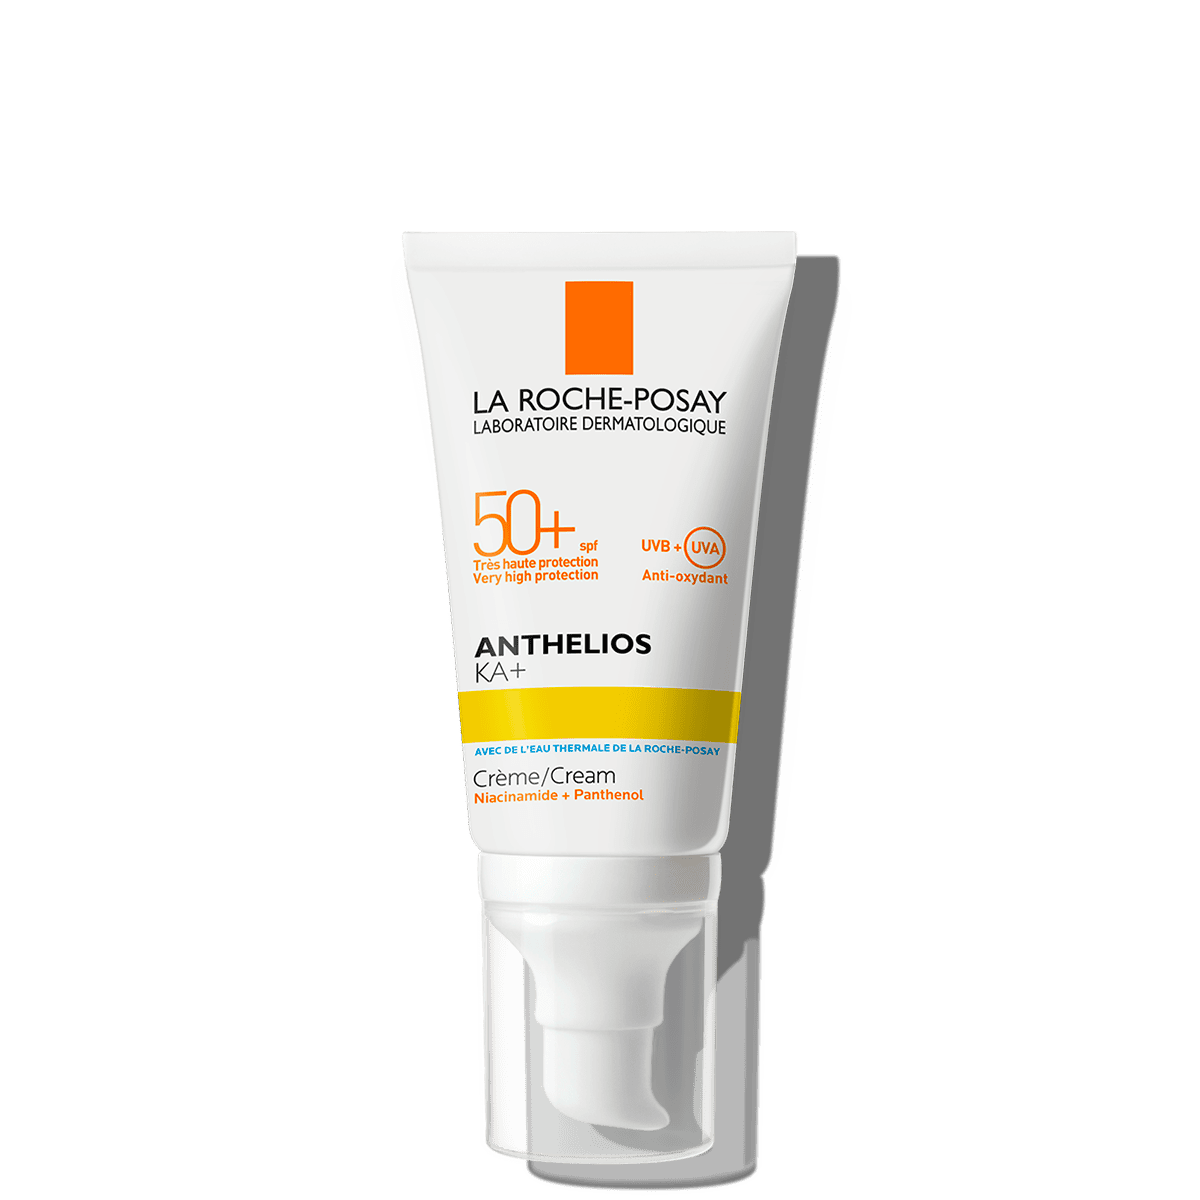 La Roche Posay ProduktSide Sol Anthelios KA SPF50 50ml 3337875650786 F